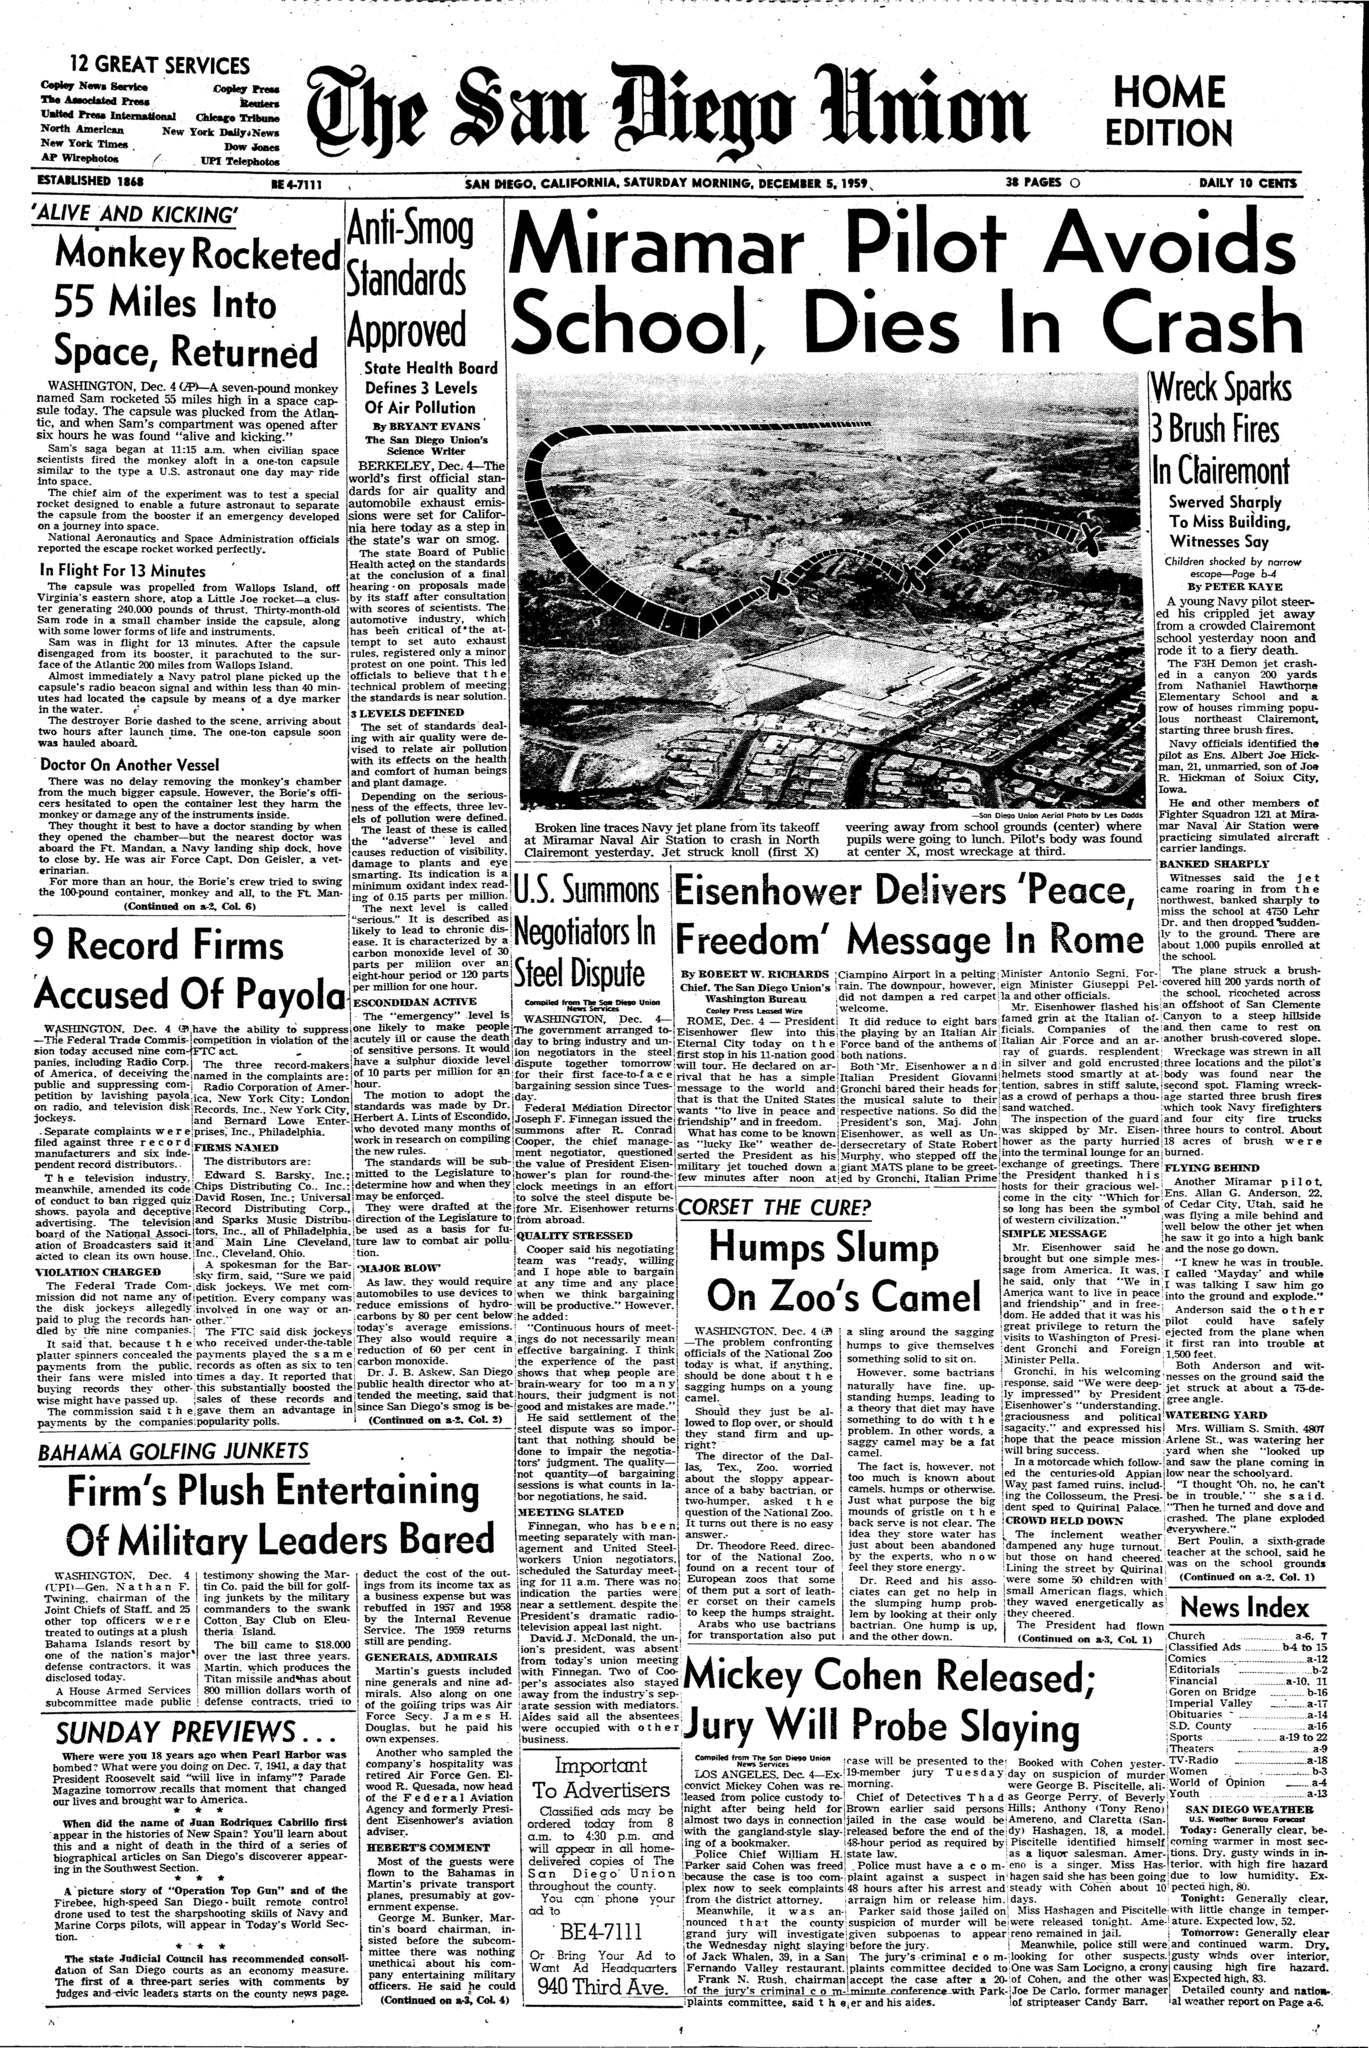 December 5, 1959